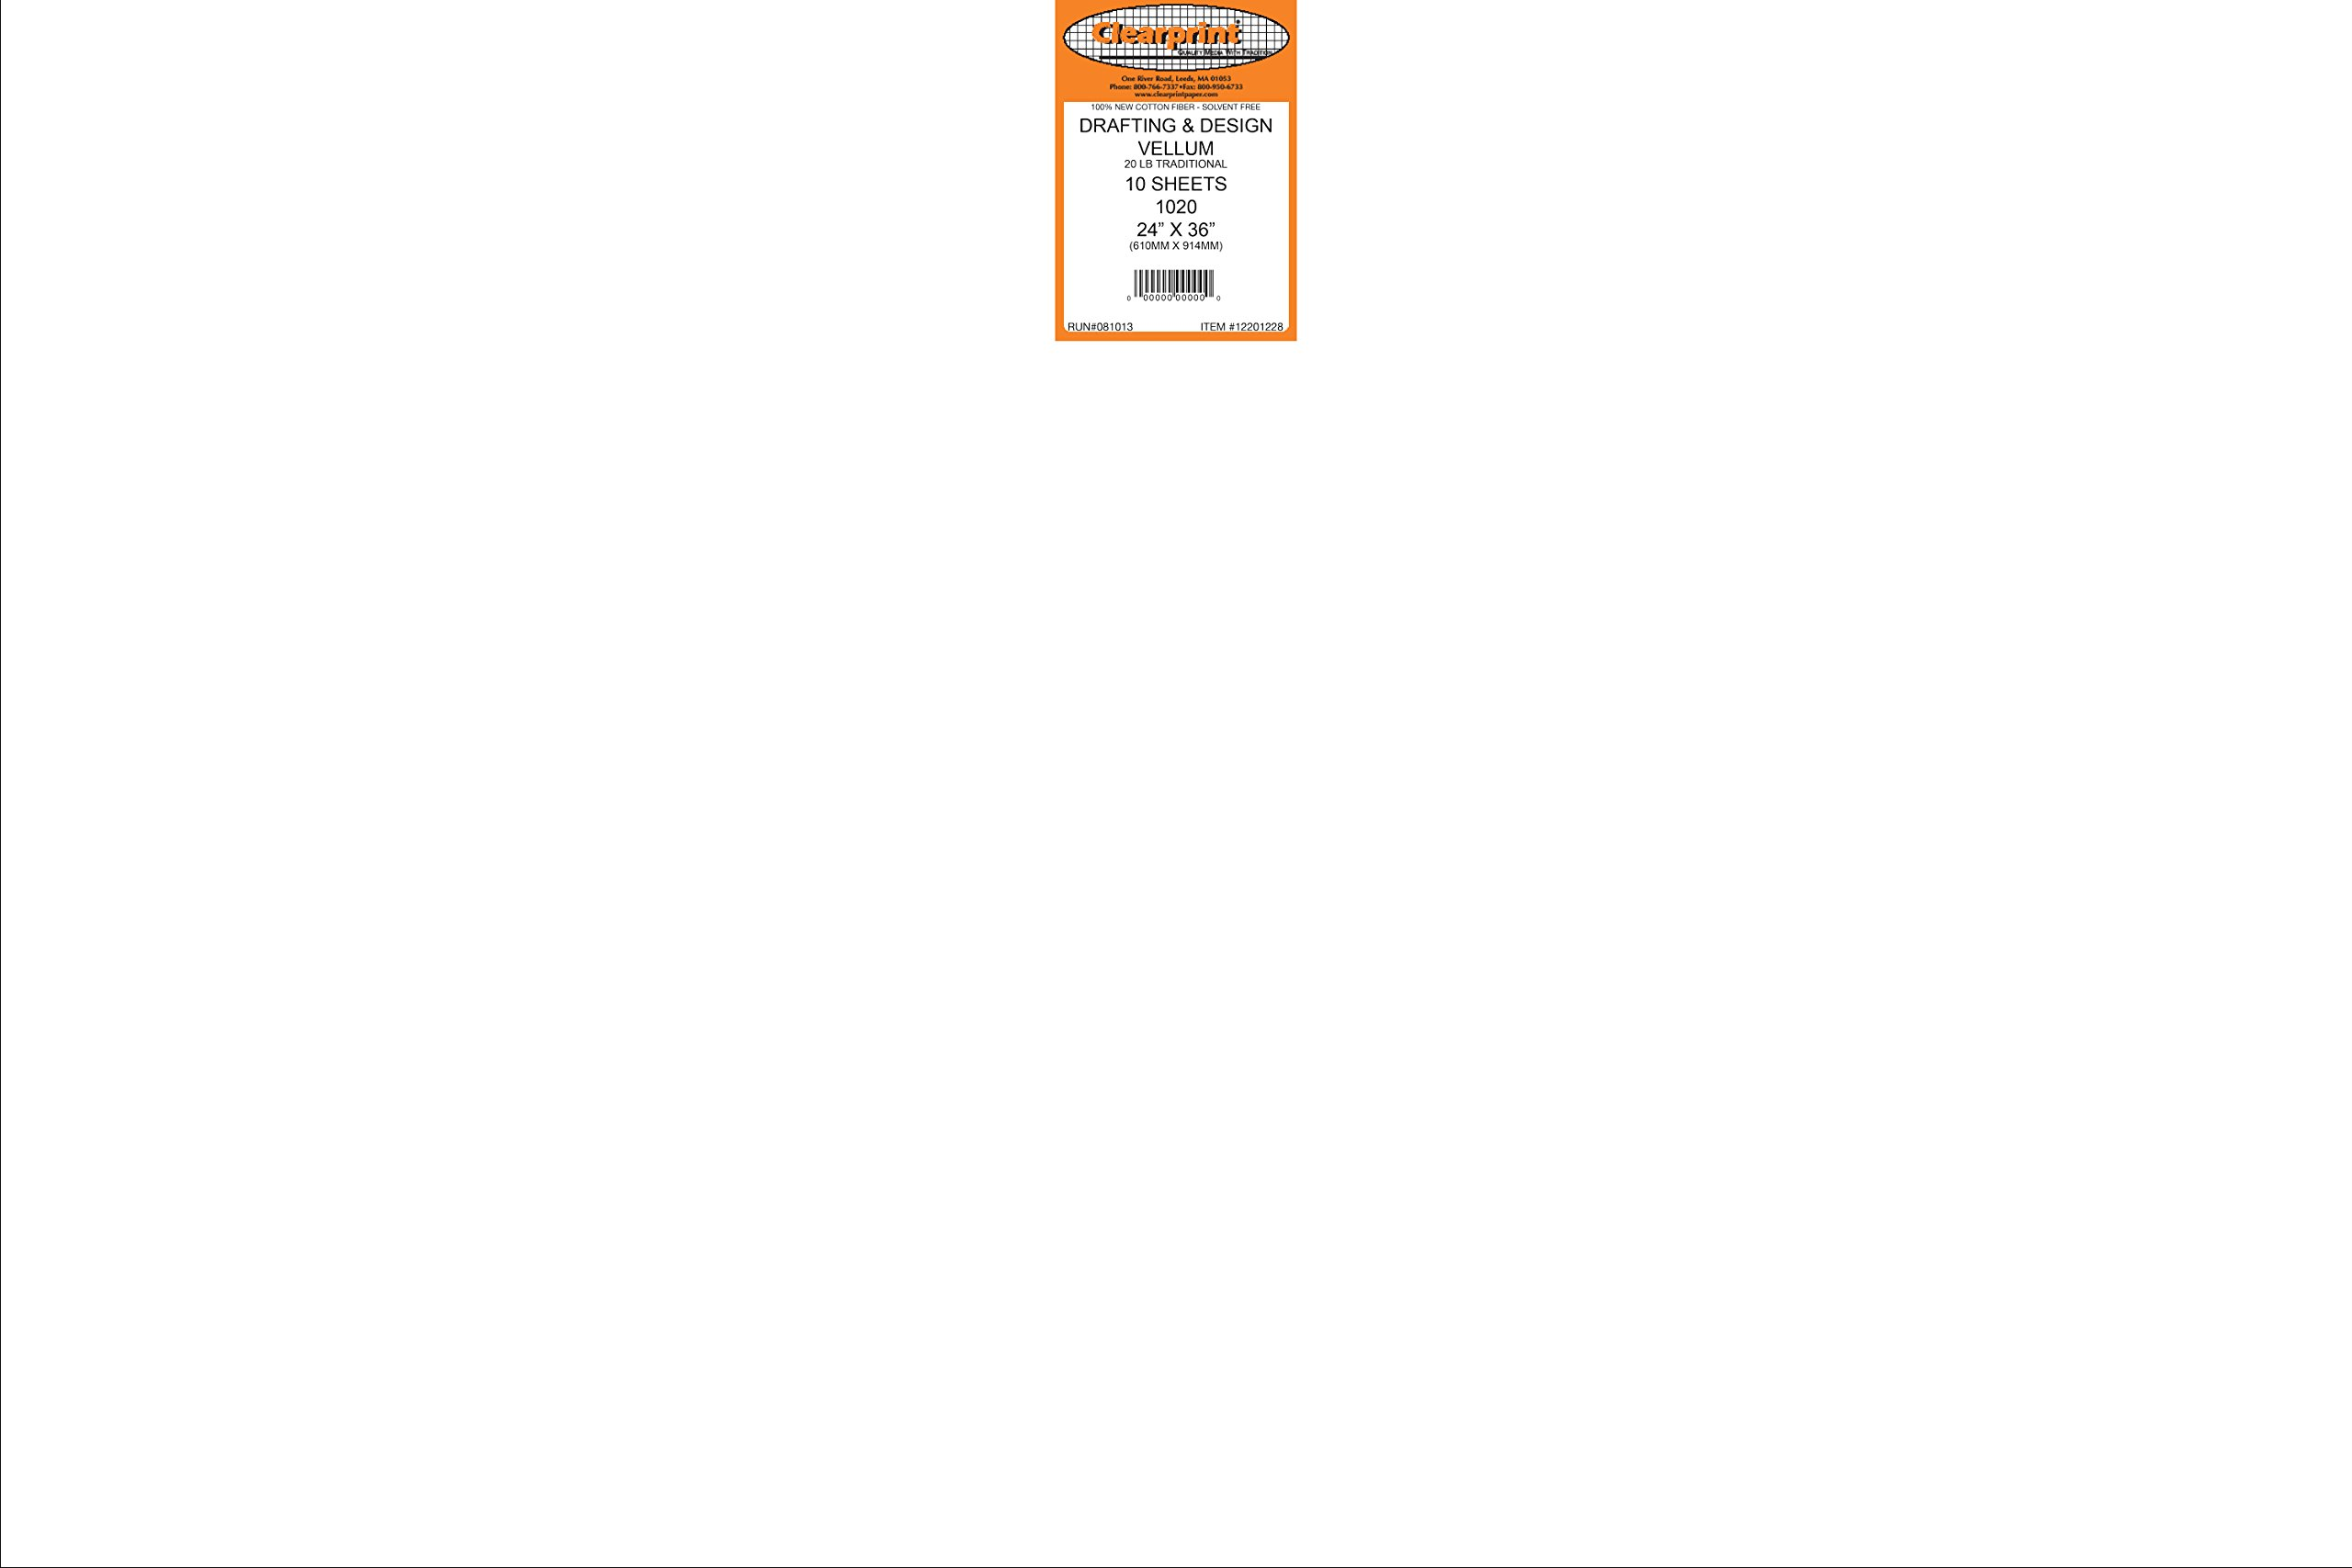 Clearprint 1020H Design Vellum Sheets, 20 lb, 100% Cotton, 24 x 36 Inches, 10 Sheets Per Pack, Translucent White, 1 Each (12201228) by Clearprint